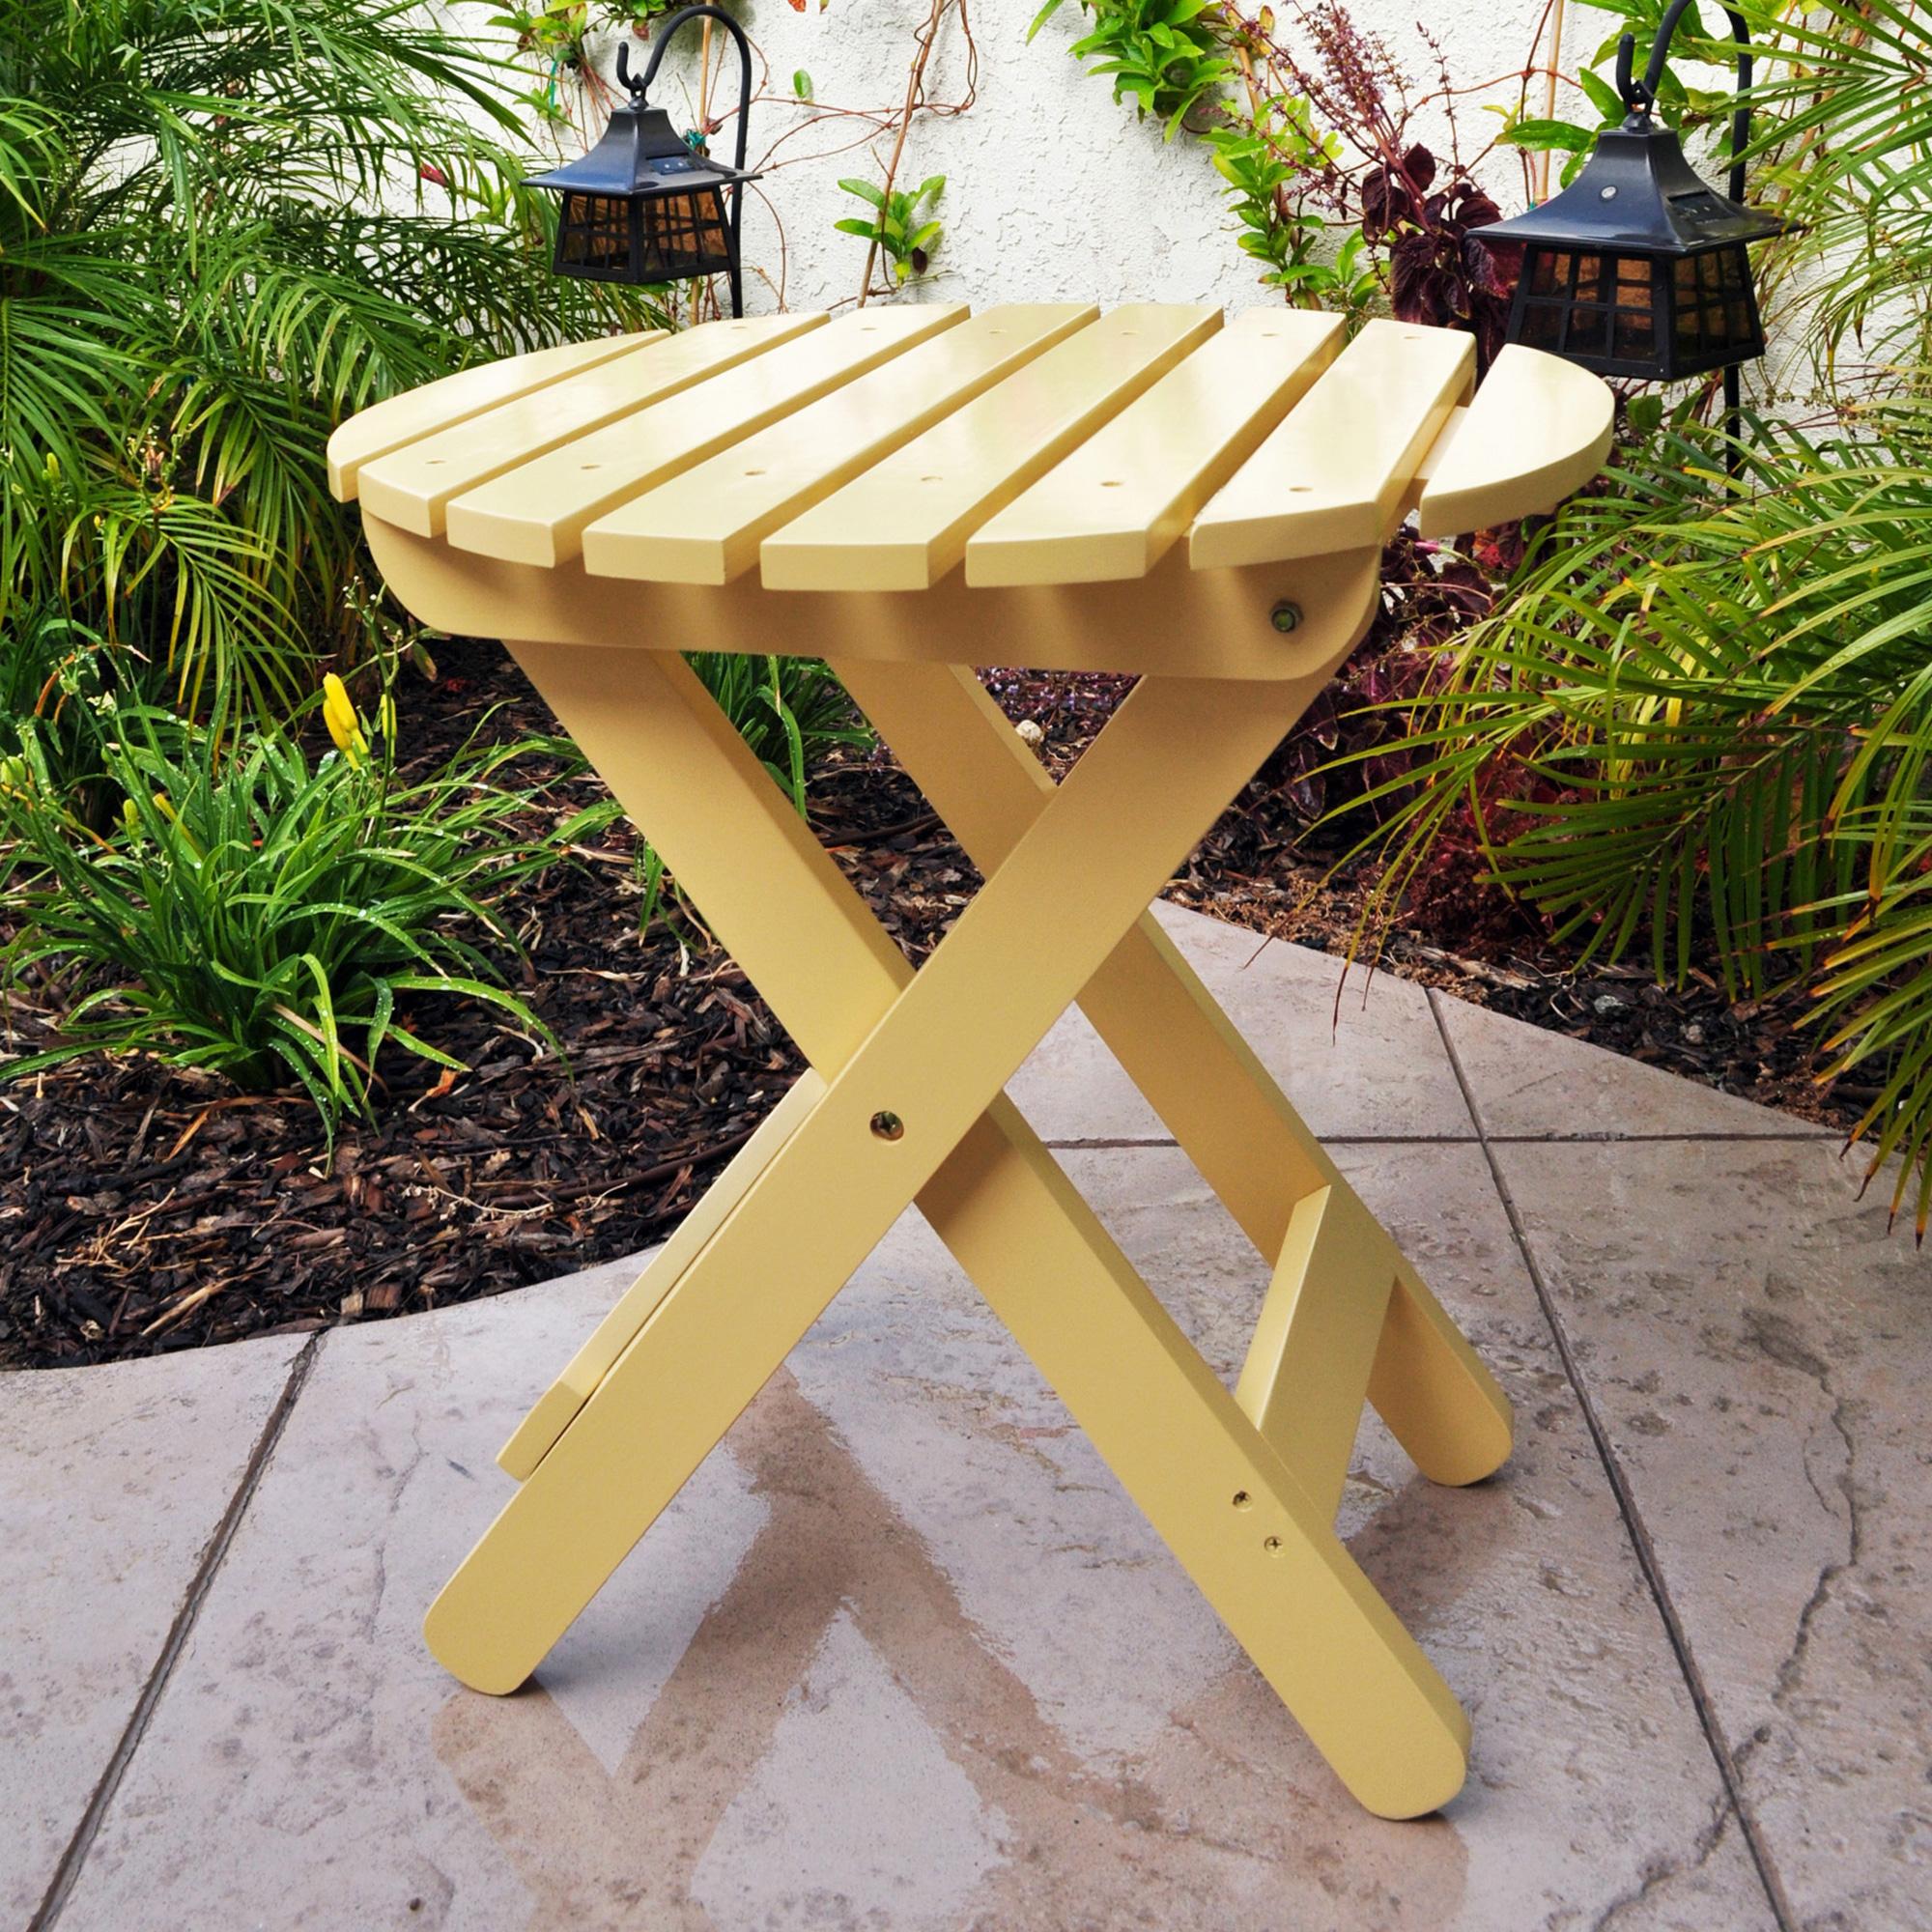 Shine Company Adirondack Round Folding Table - Bee's Wax